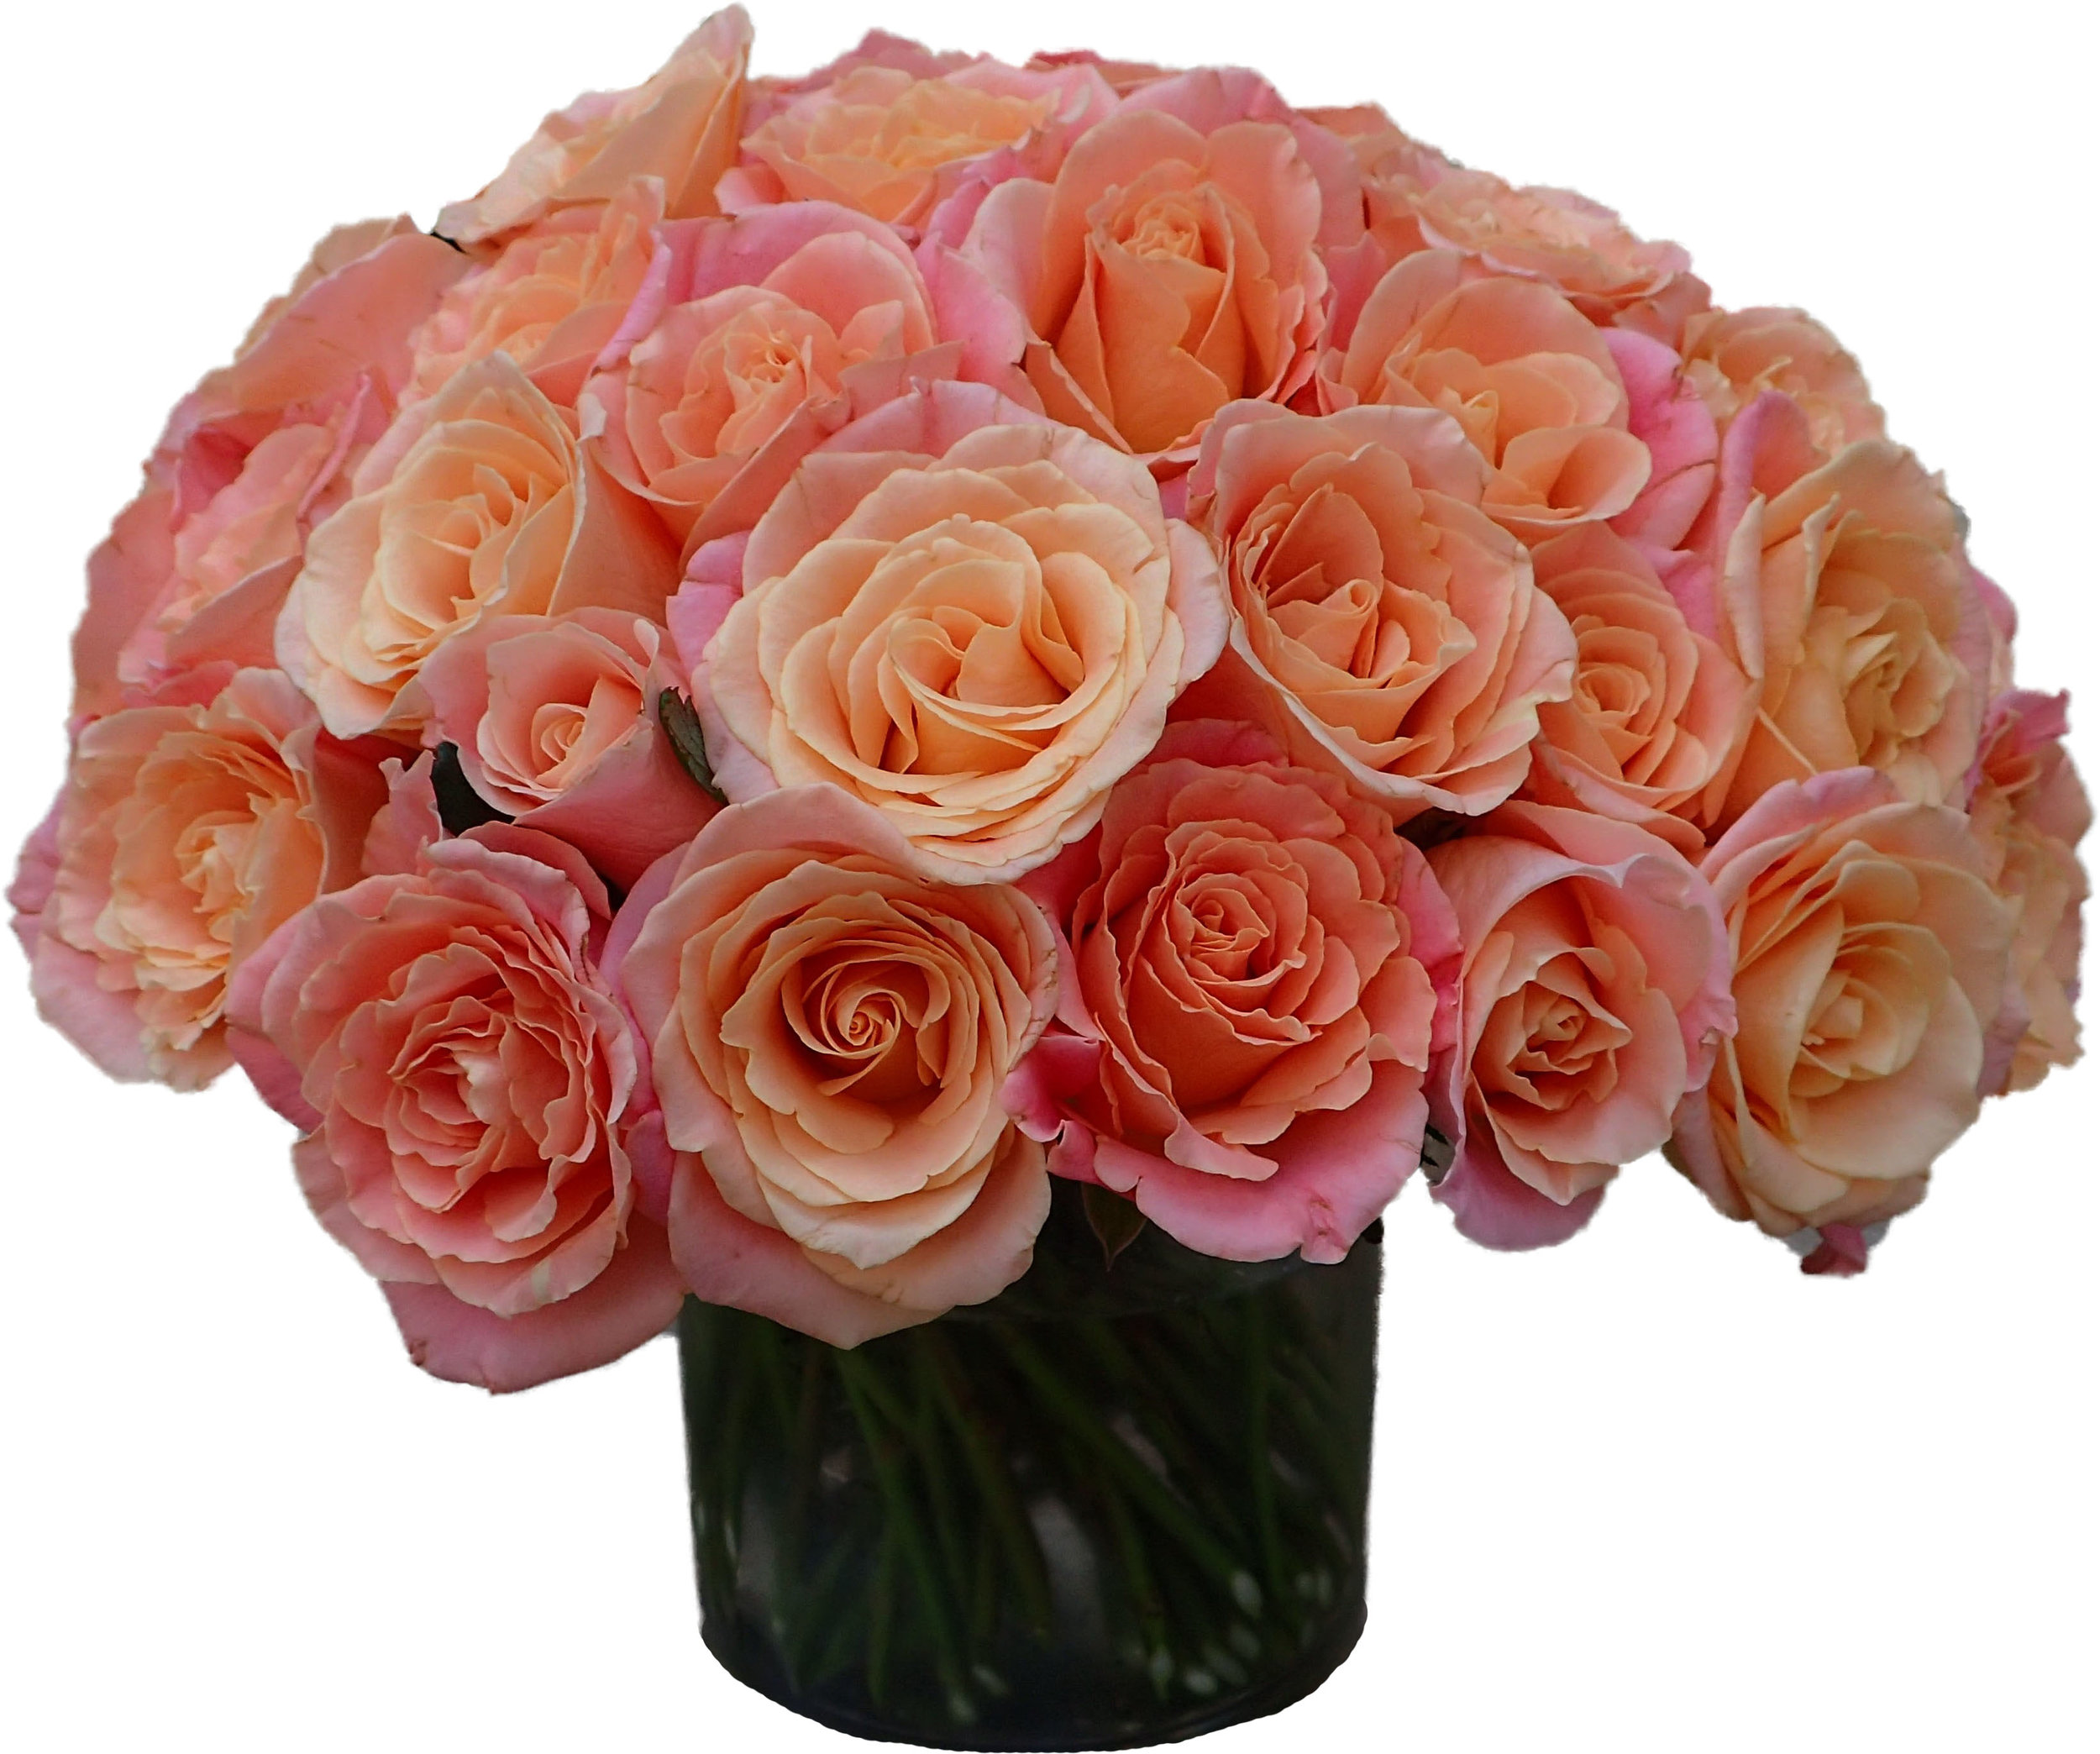 Peach Pink Roses start at $150